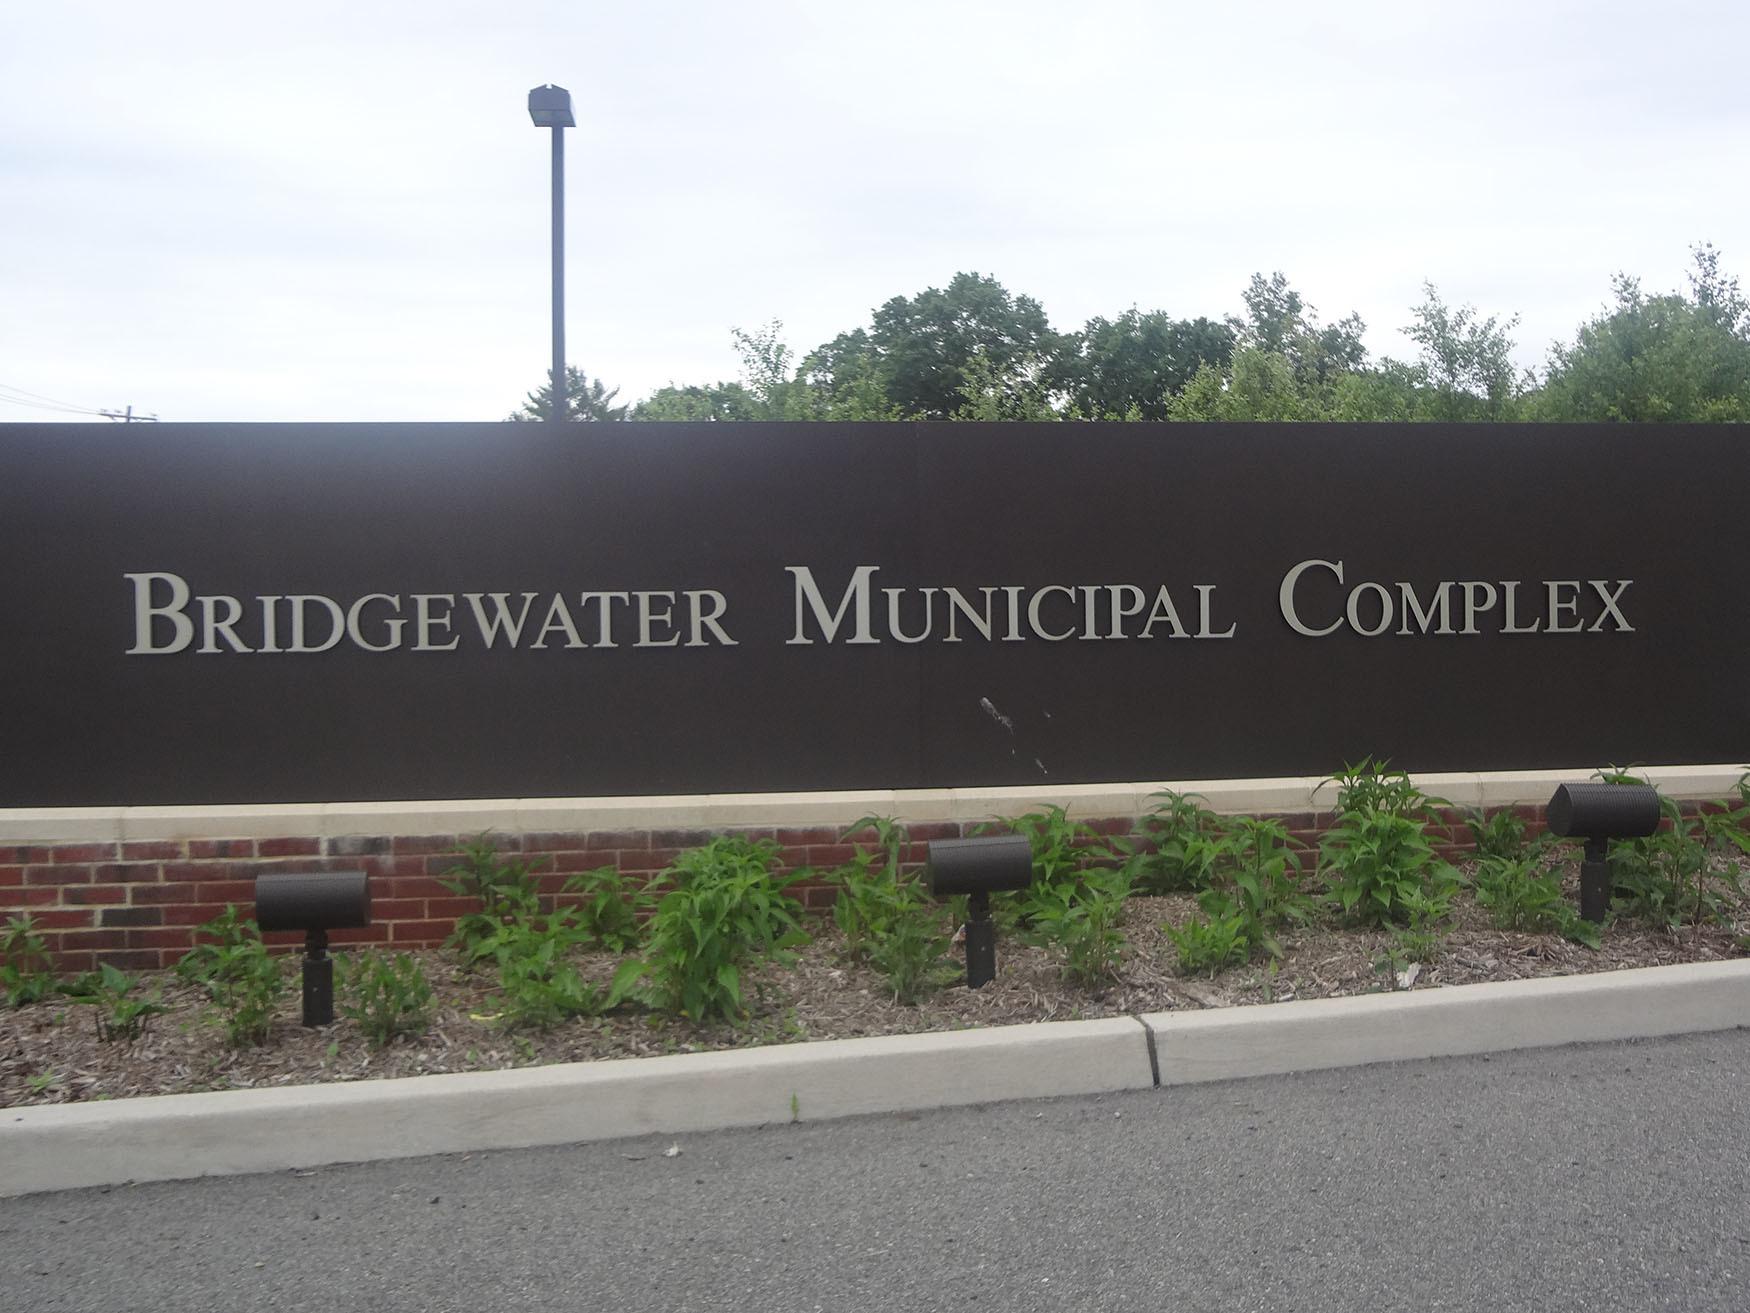 dfccf9b5808173e92c5c_Bridgewater_municipal.jpg